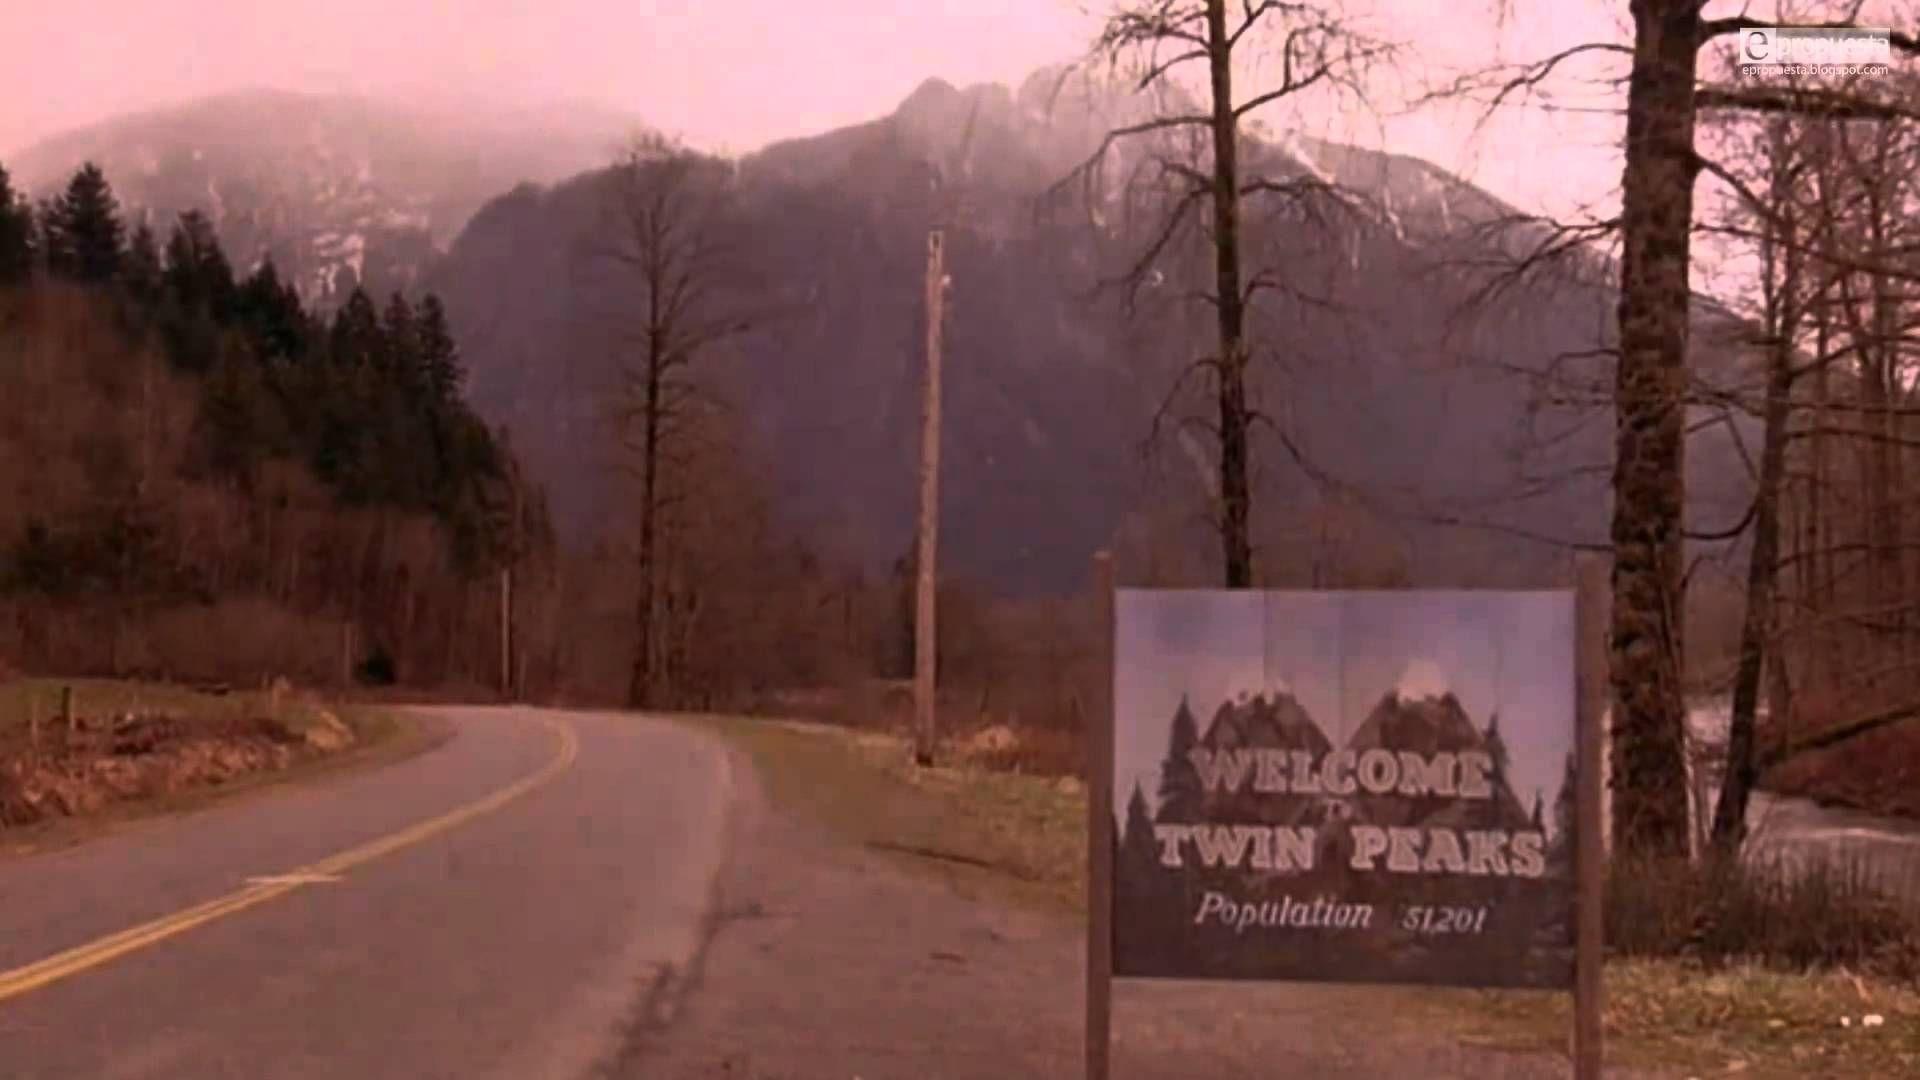 twin peaks hd wallpapers for desktop download | best games